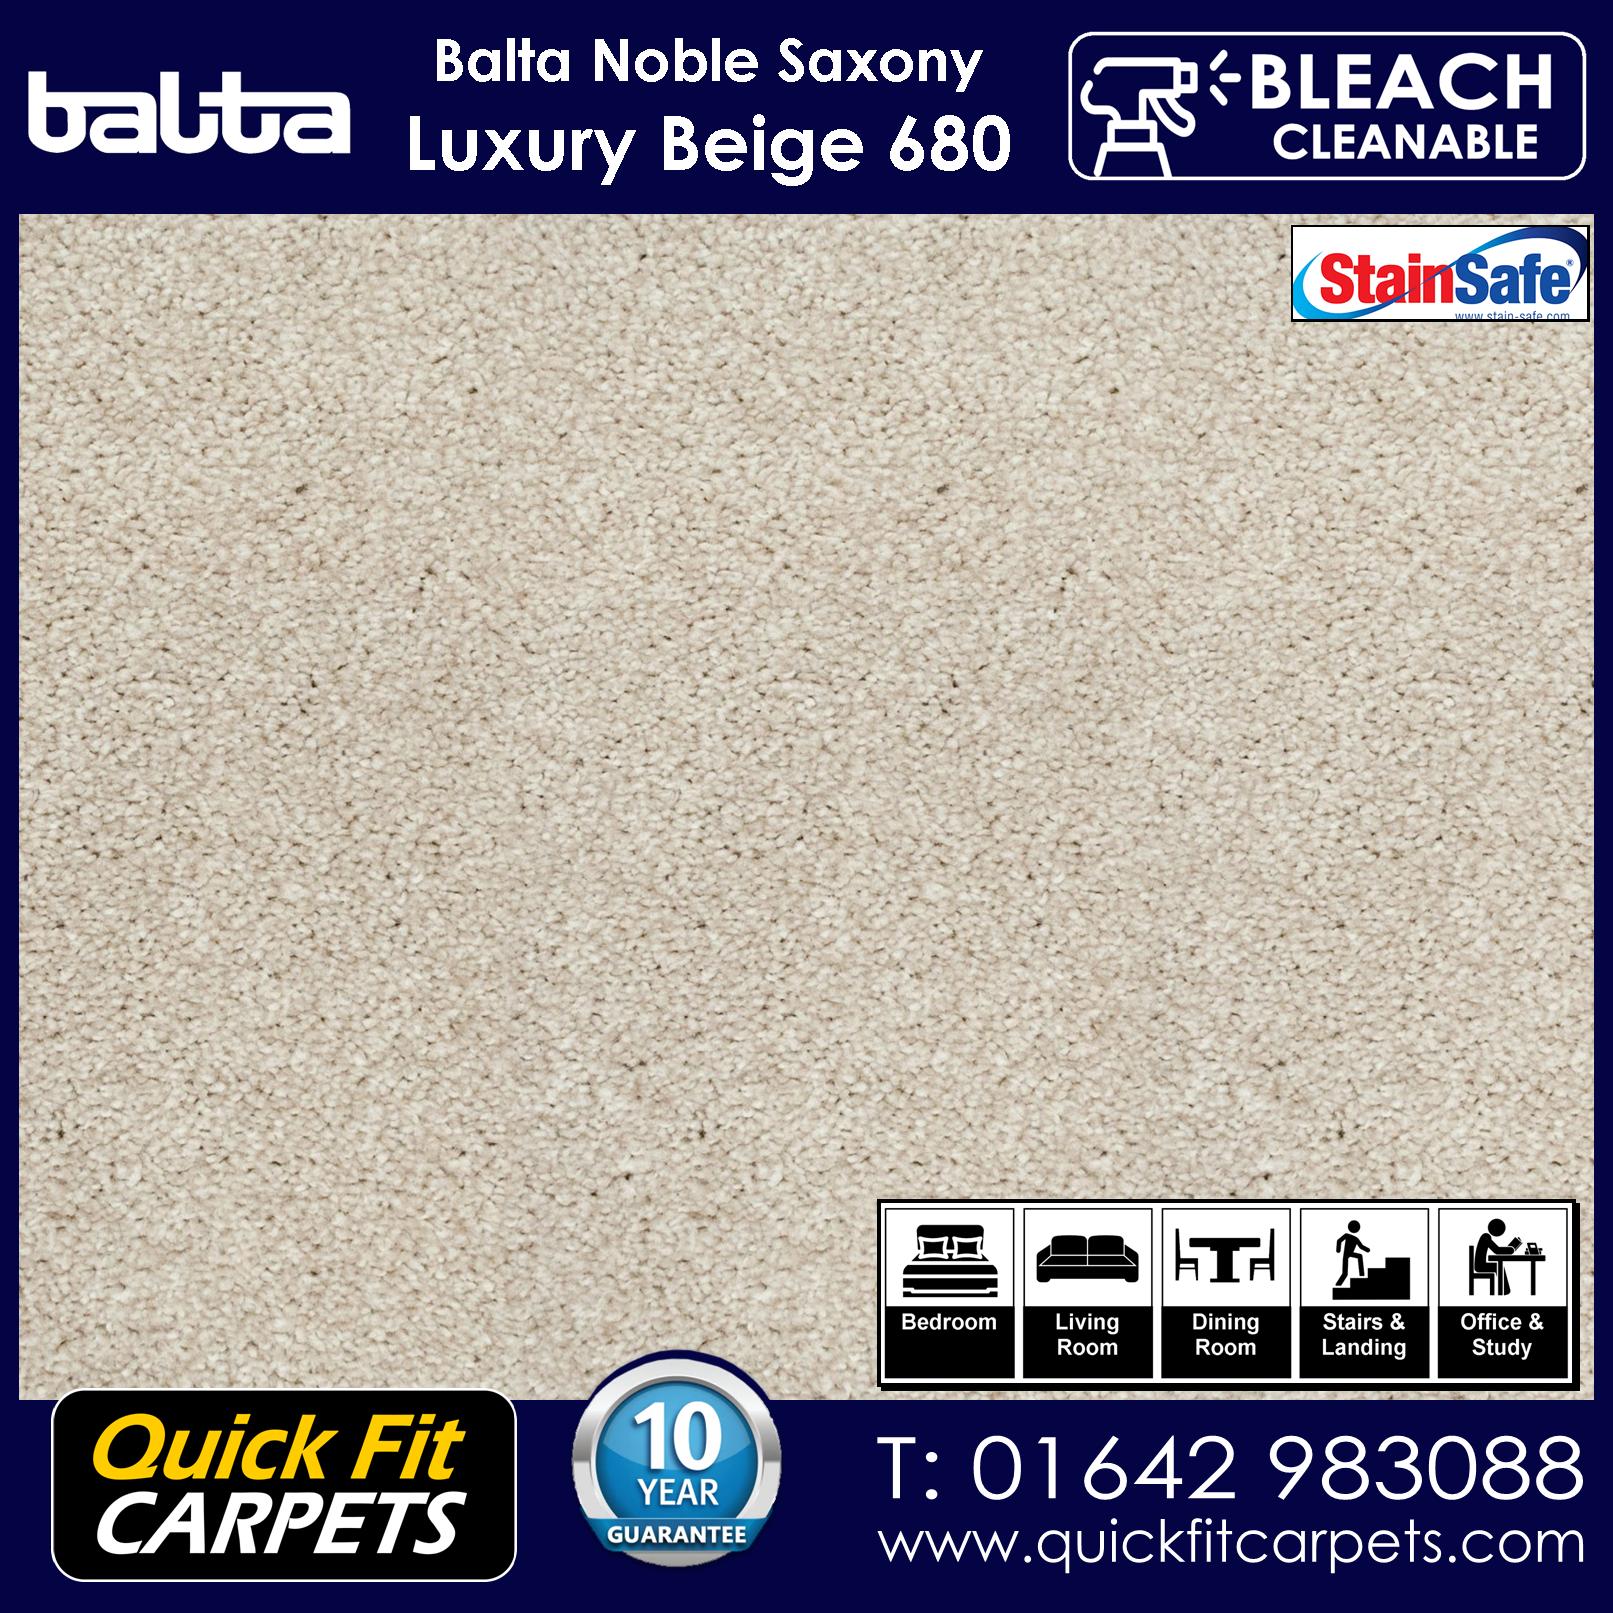 Quick Fit Carpets Balta Luxury Pile Luxury Beige 680